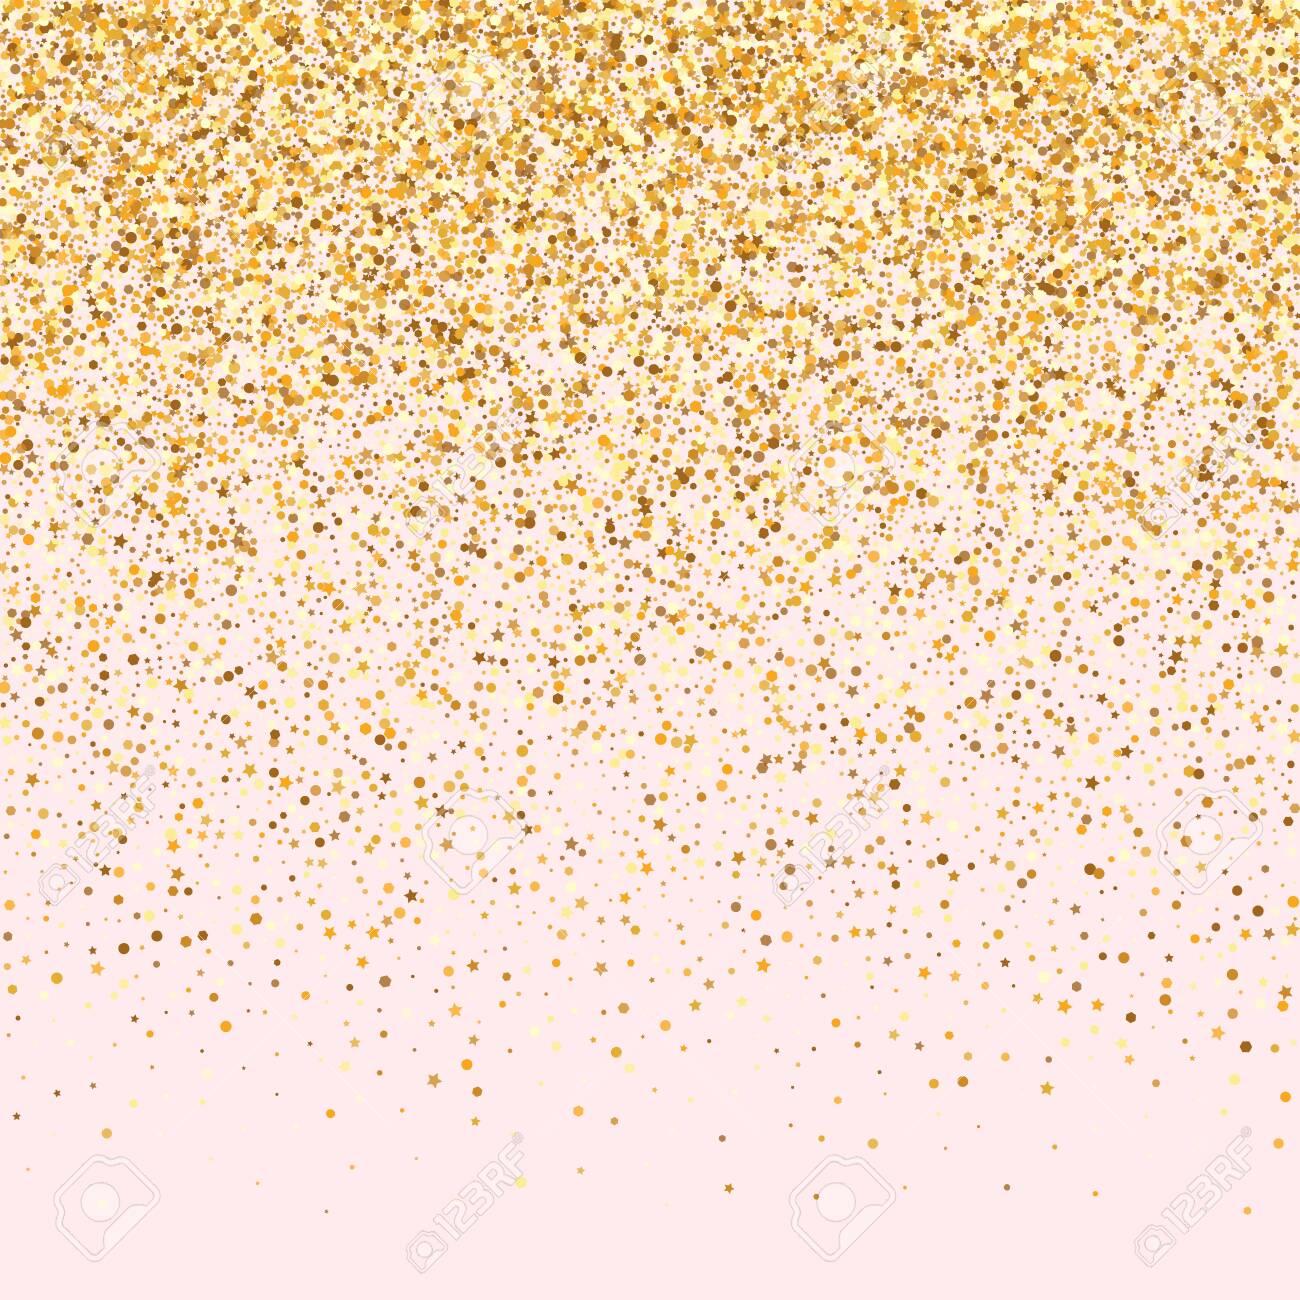 Yellow Dot Glamour Pink Background. Luxury Confetti Postcard. Golden Sparkle Rich Wallpaper. Circle Bridal Invitation. - 151020725